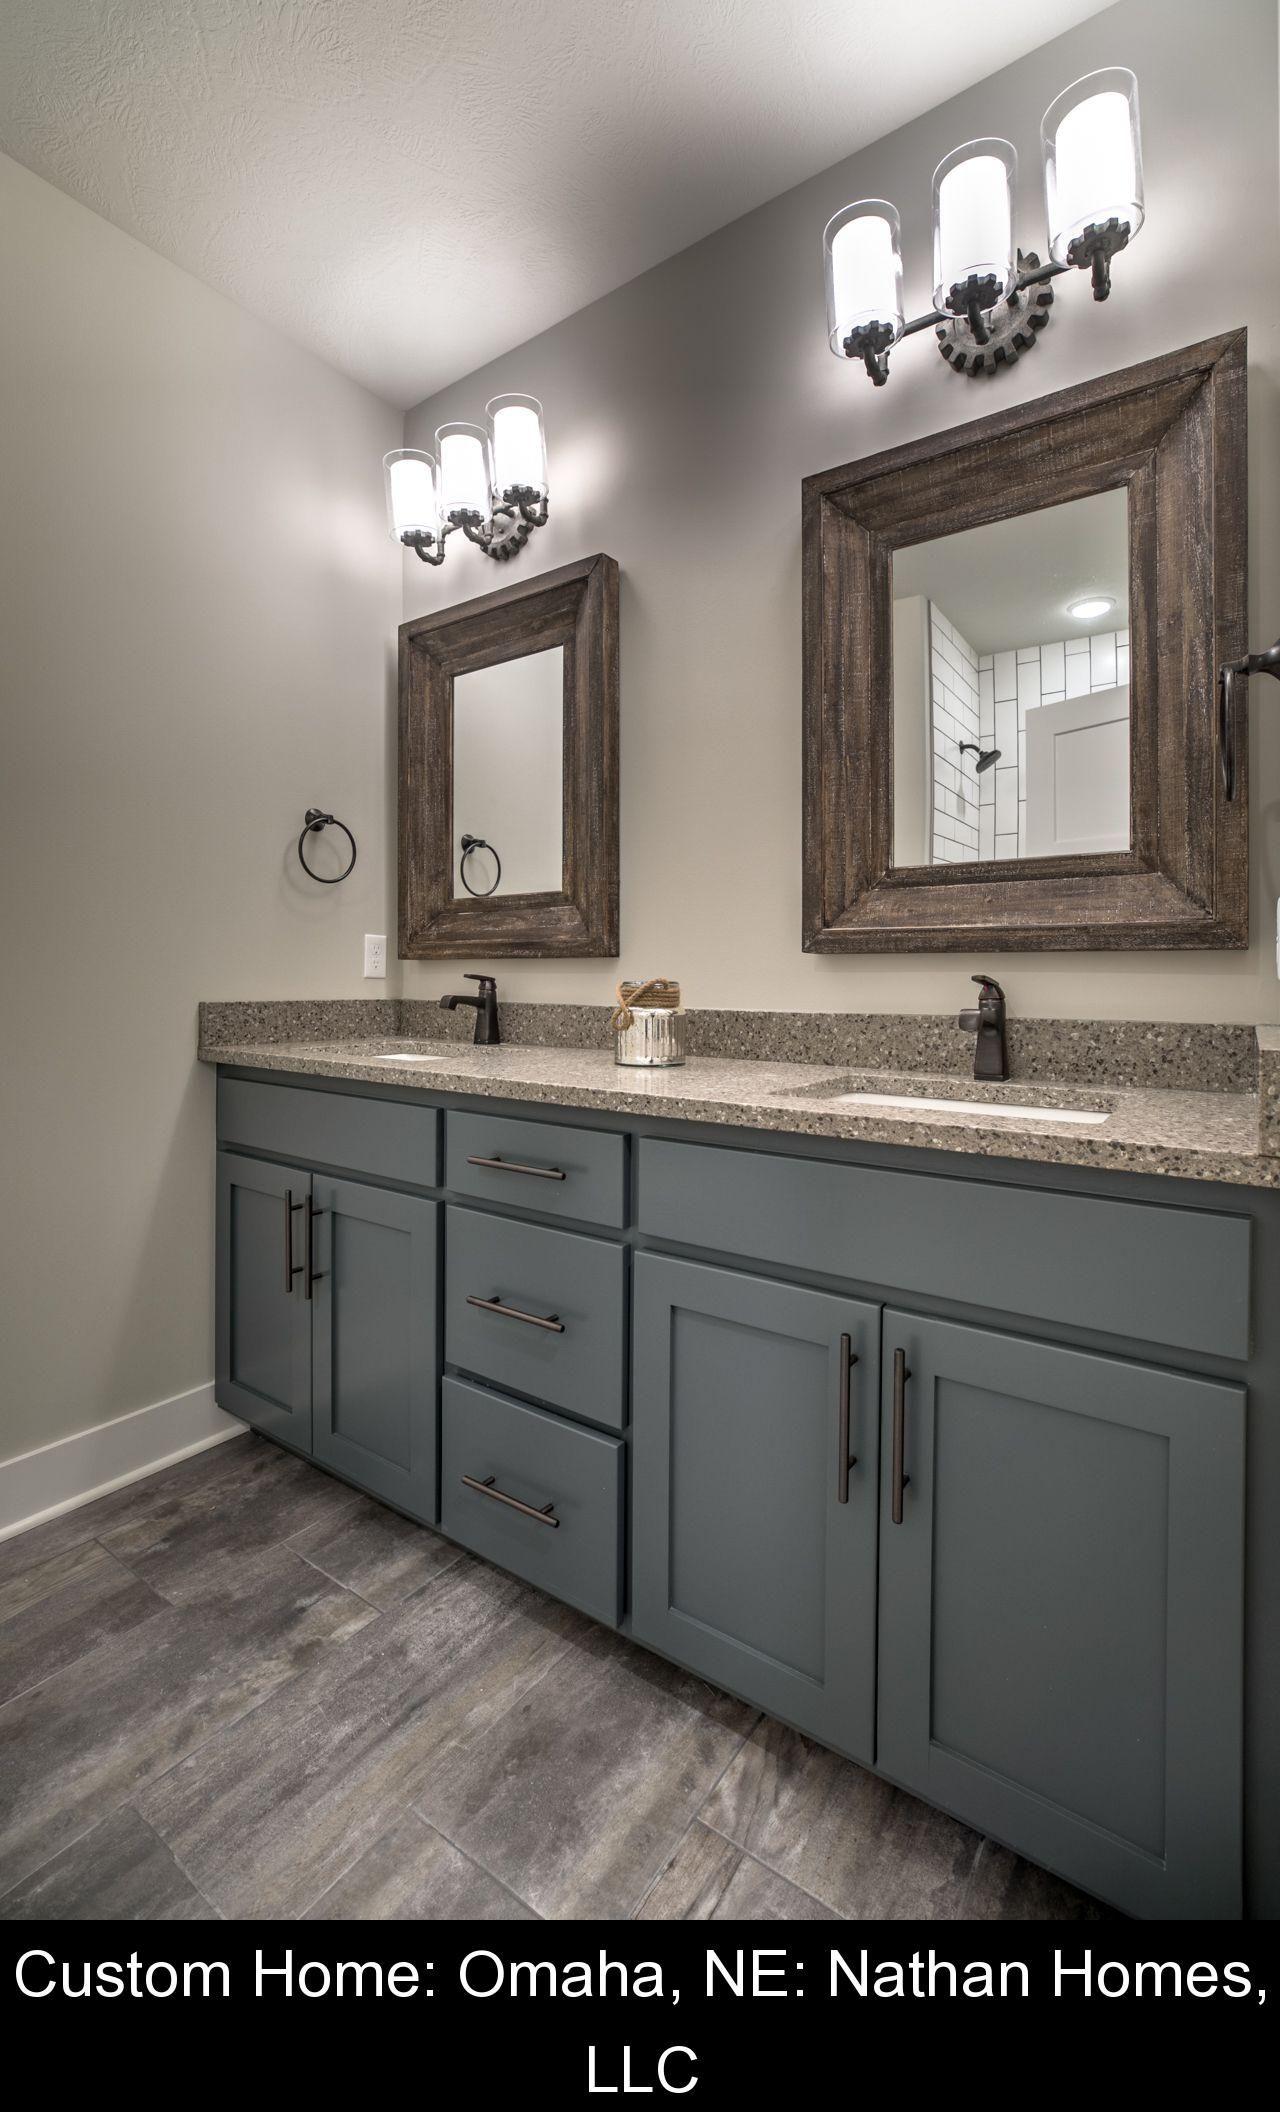 Custom Home Omaha Ne Nathan Homes Llc 66472 Bathroom Renovations Bathroomrenovations 2020 Banyo Yeniden Modelleme Banyo Yenileme Ev Dekoru